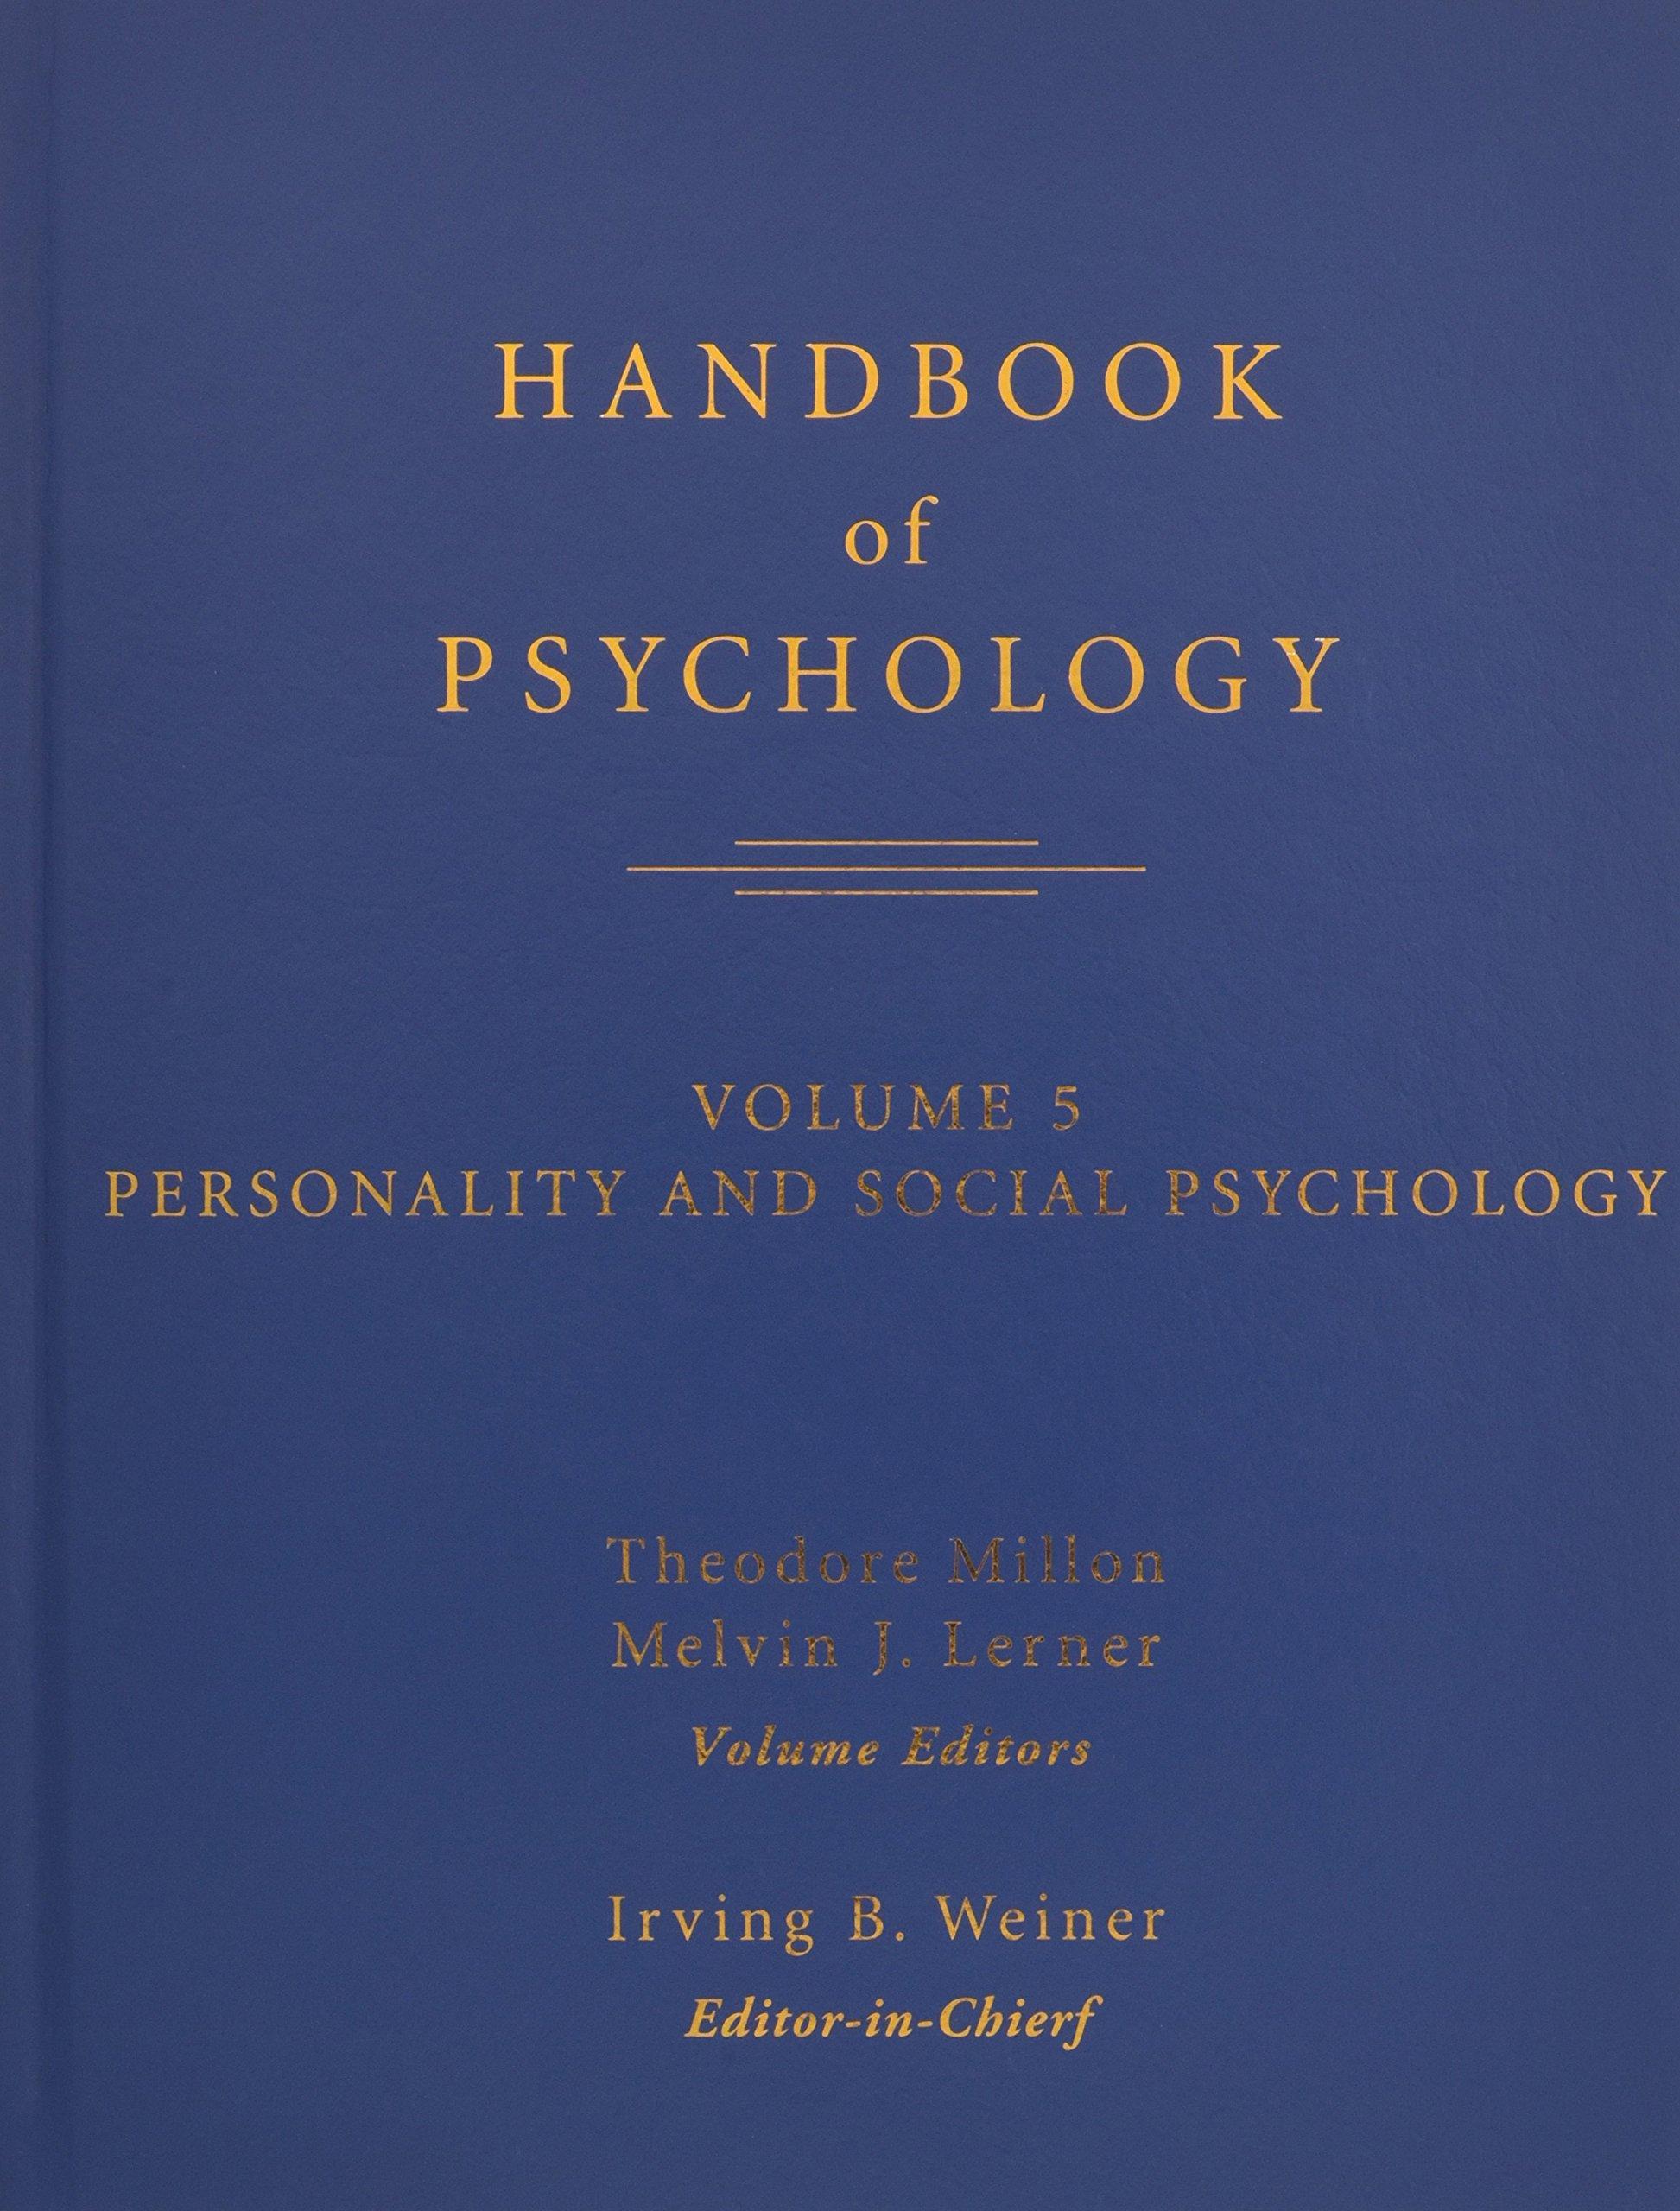 Download Handbook of Psychology, Personality and Social Psychology (Volume 5) pdf epub